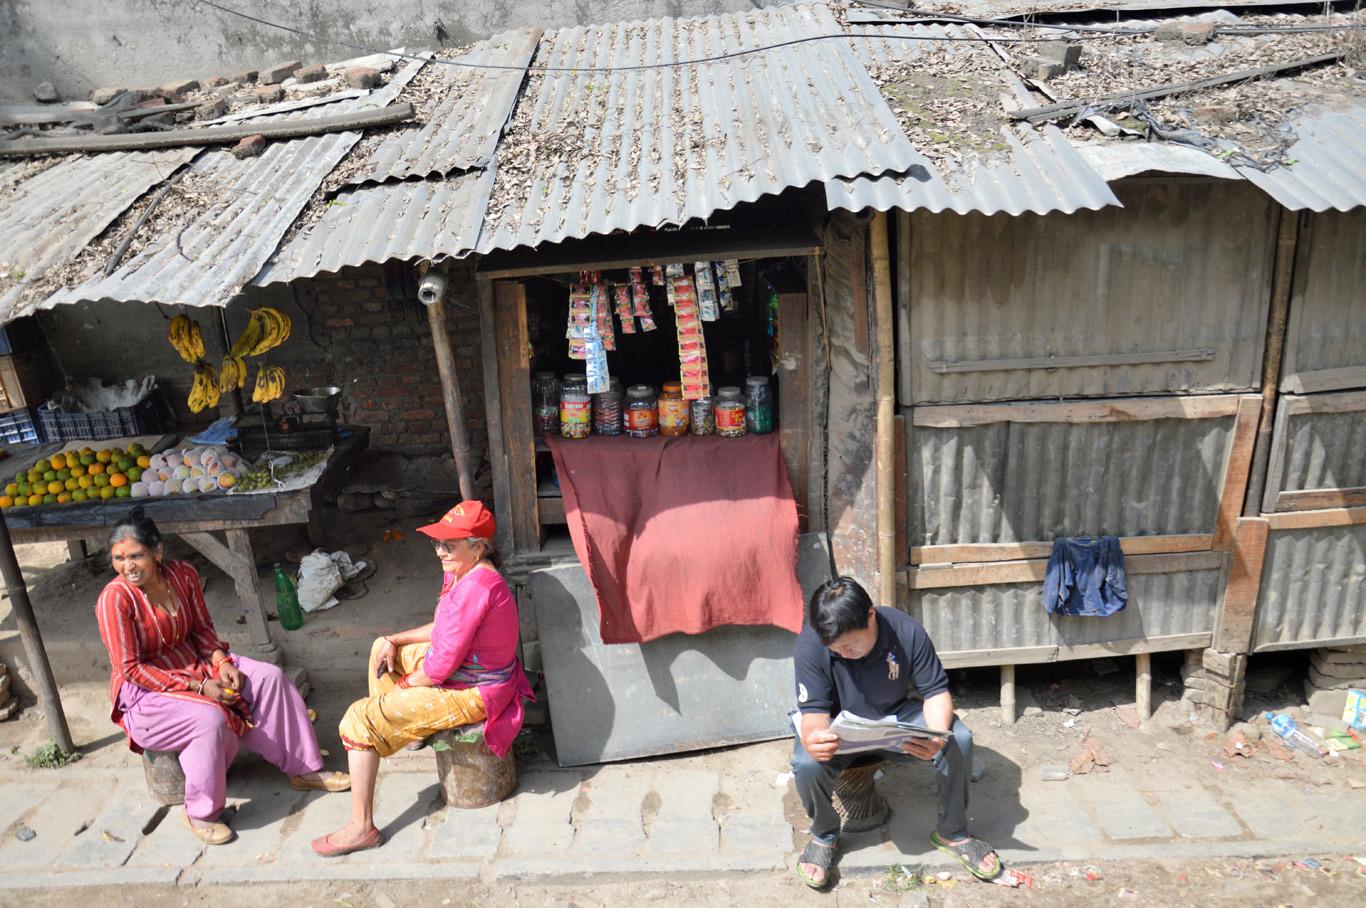 The suburbs of Kathmandu